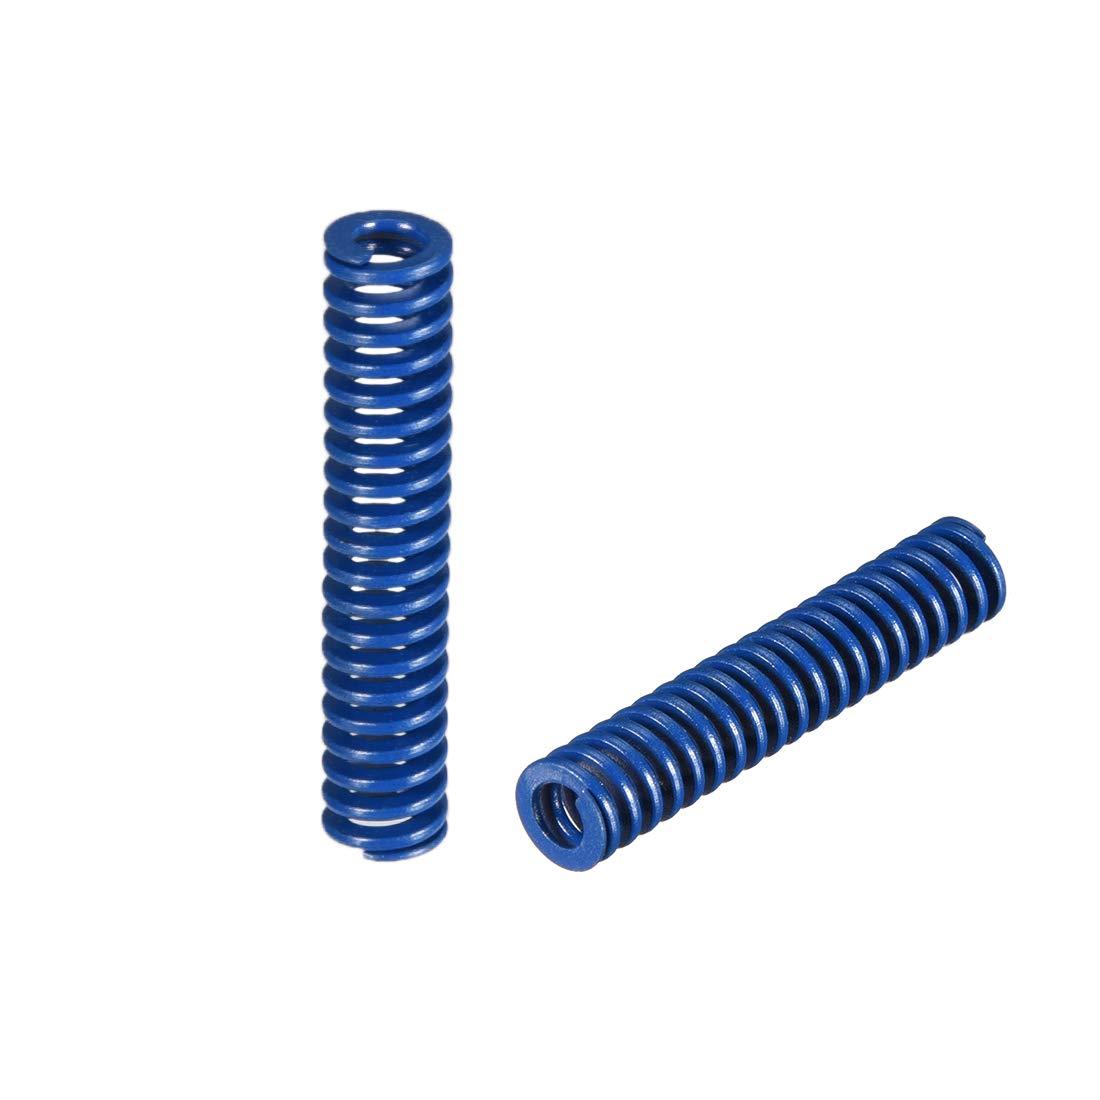 uxcell 8mm OD 40mm Long Spiral Stamping Light Load Compression Mould Die Spring Blue 2Pcs